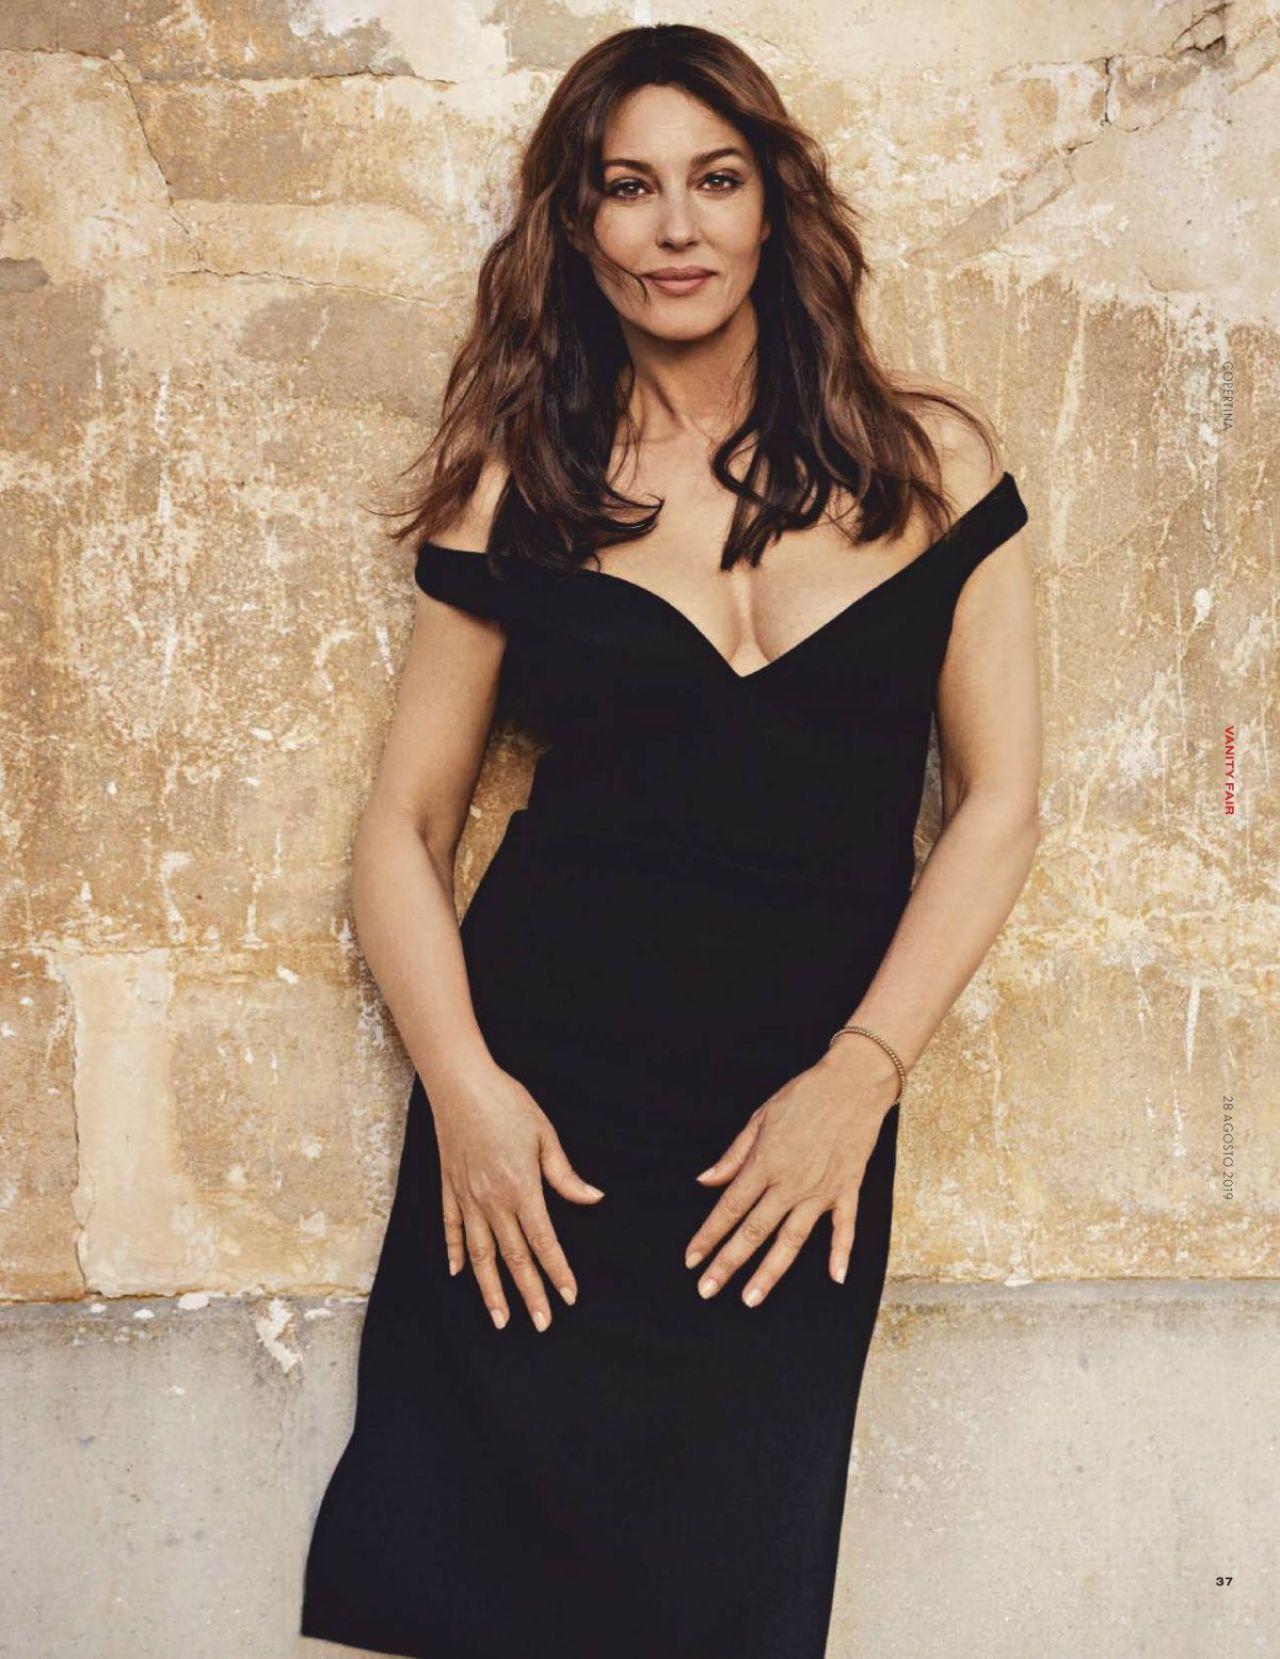 Monica Bellucci, 54 : PrettyOlderWomen